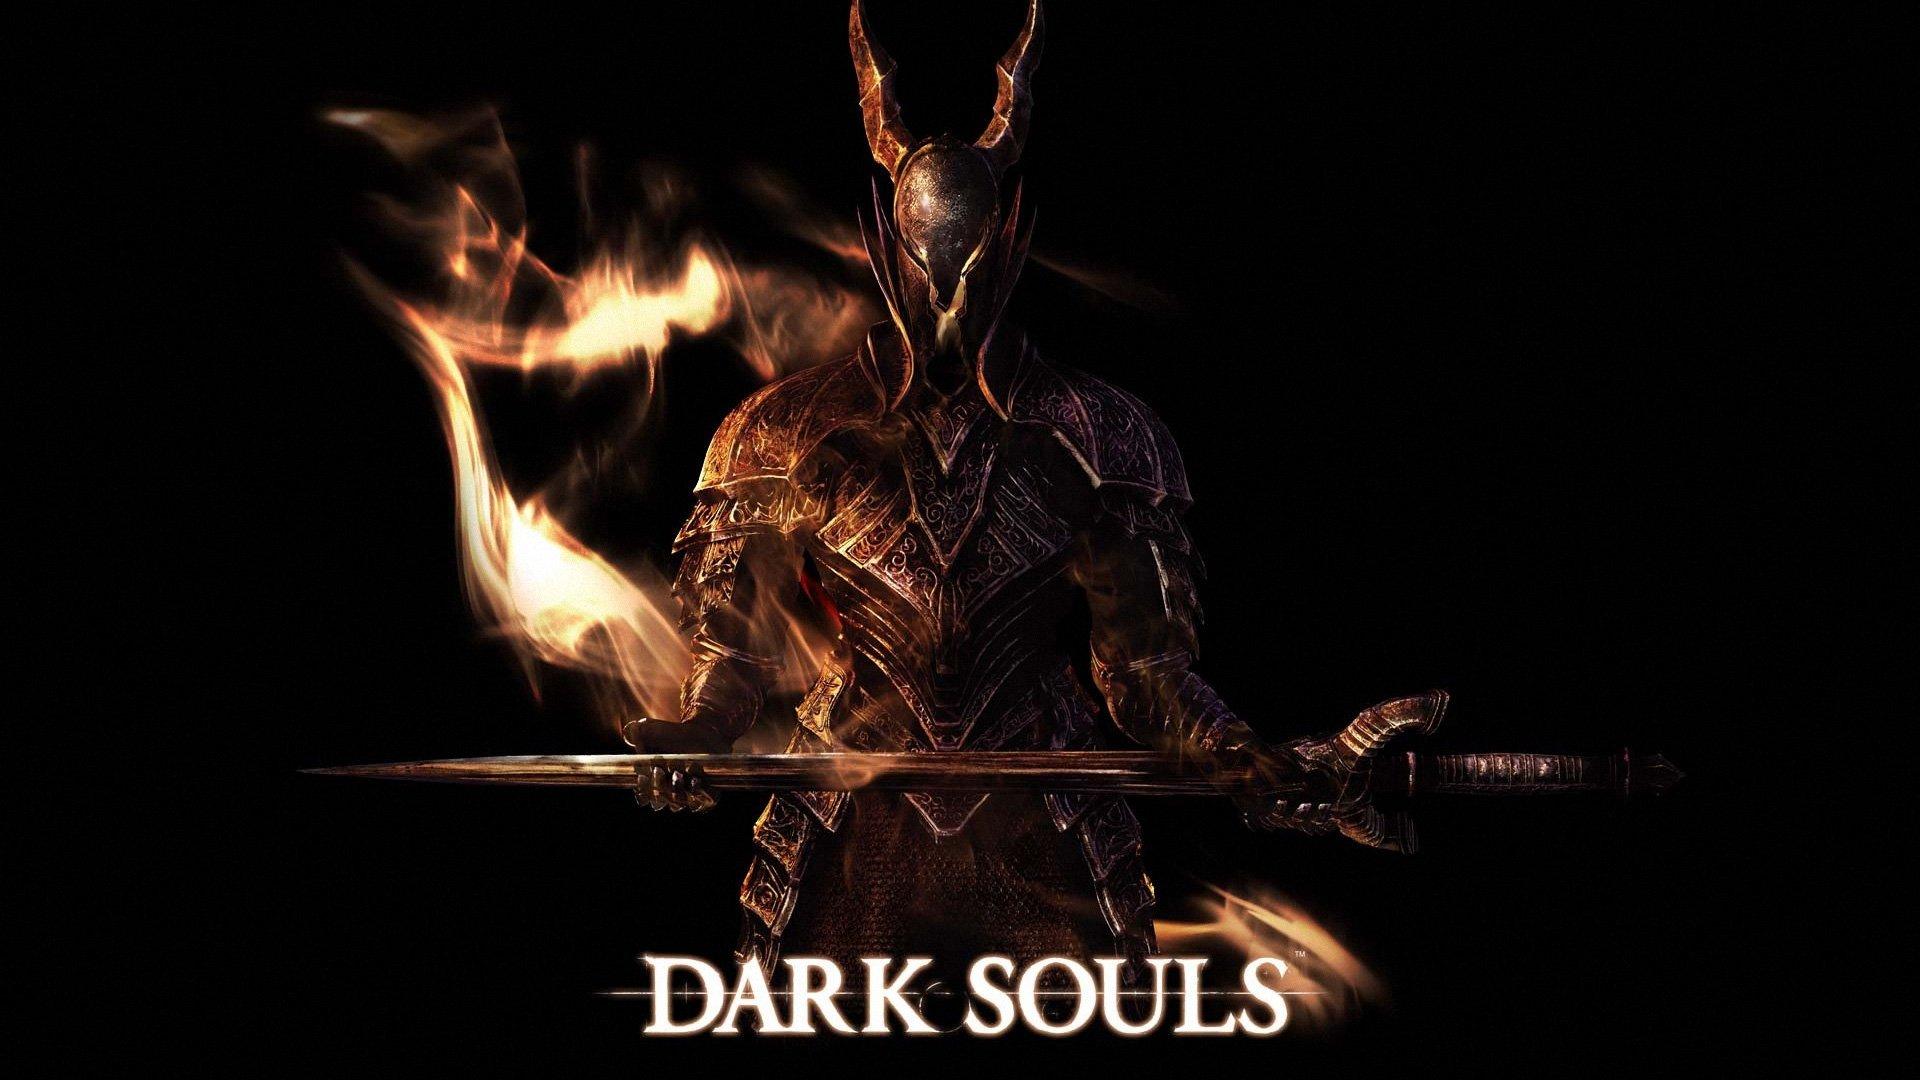 dark souls 1080p Wallpaper 1920x1080